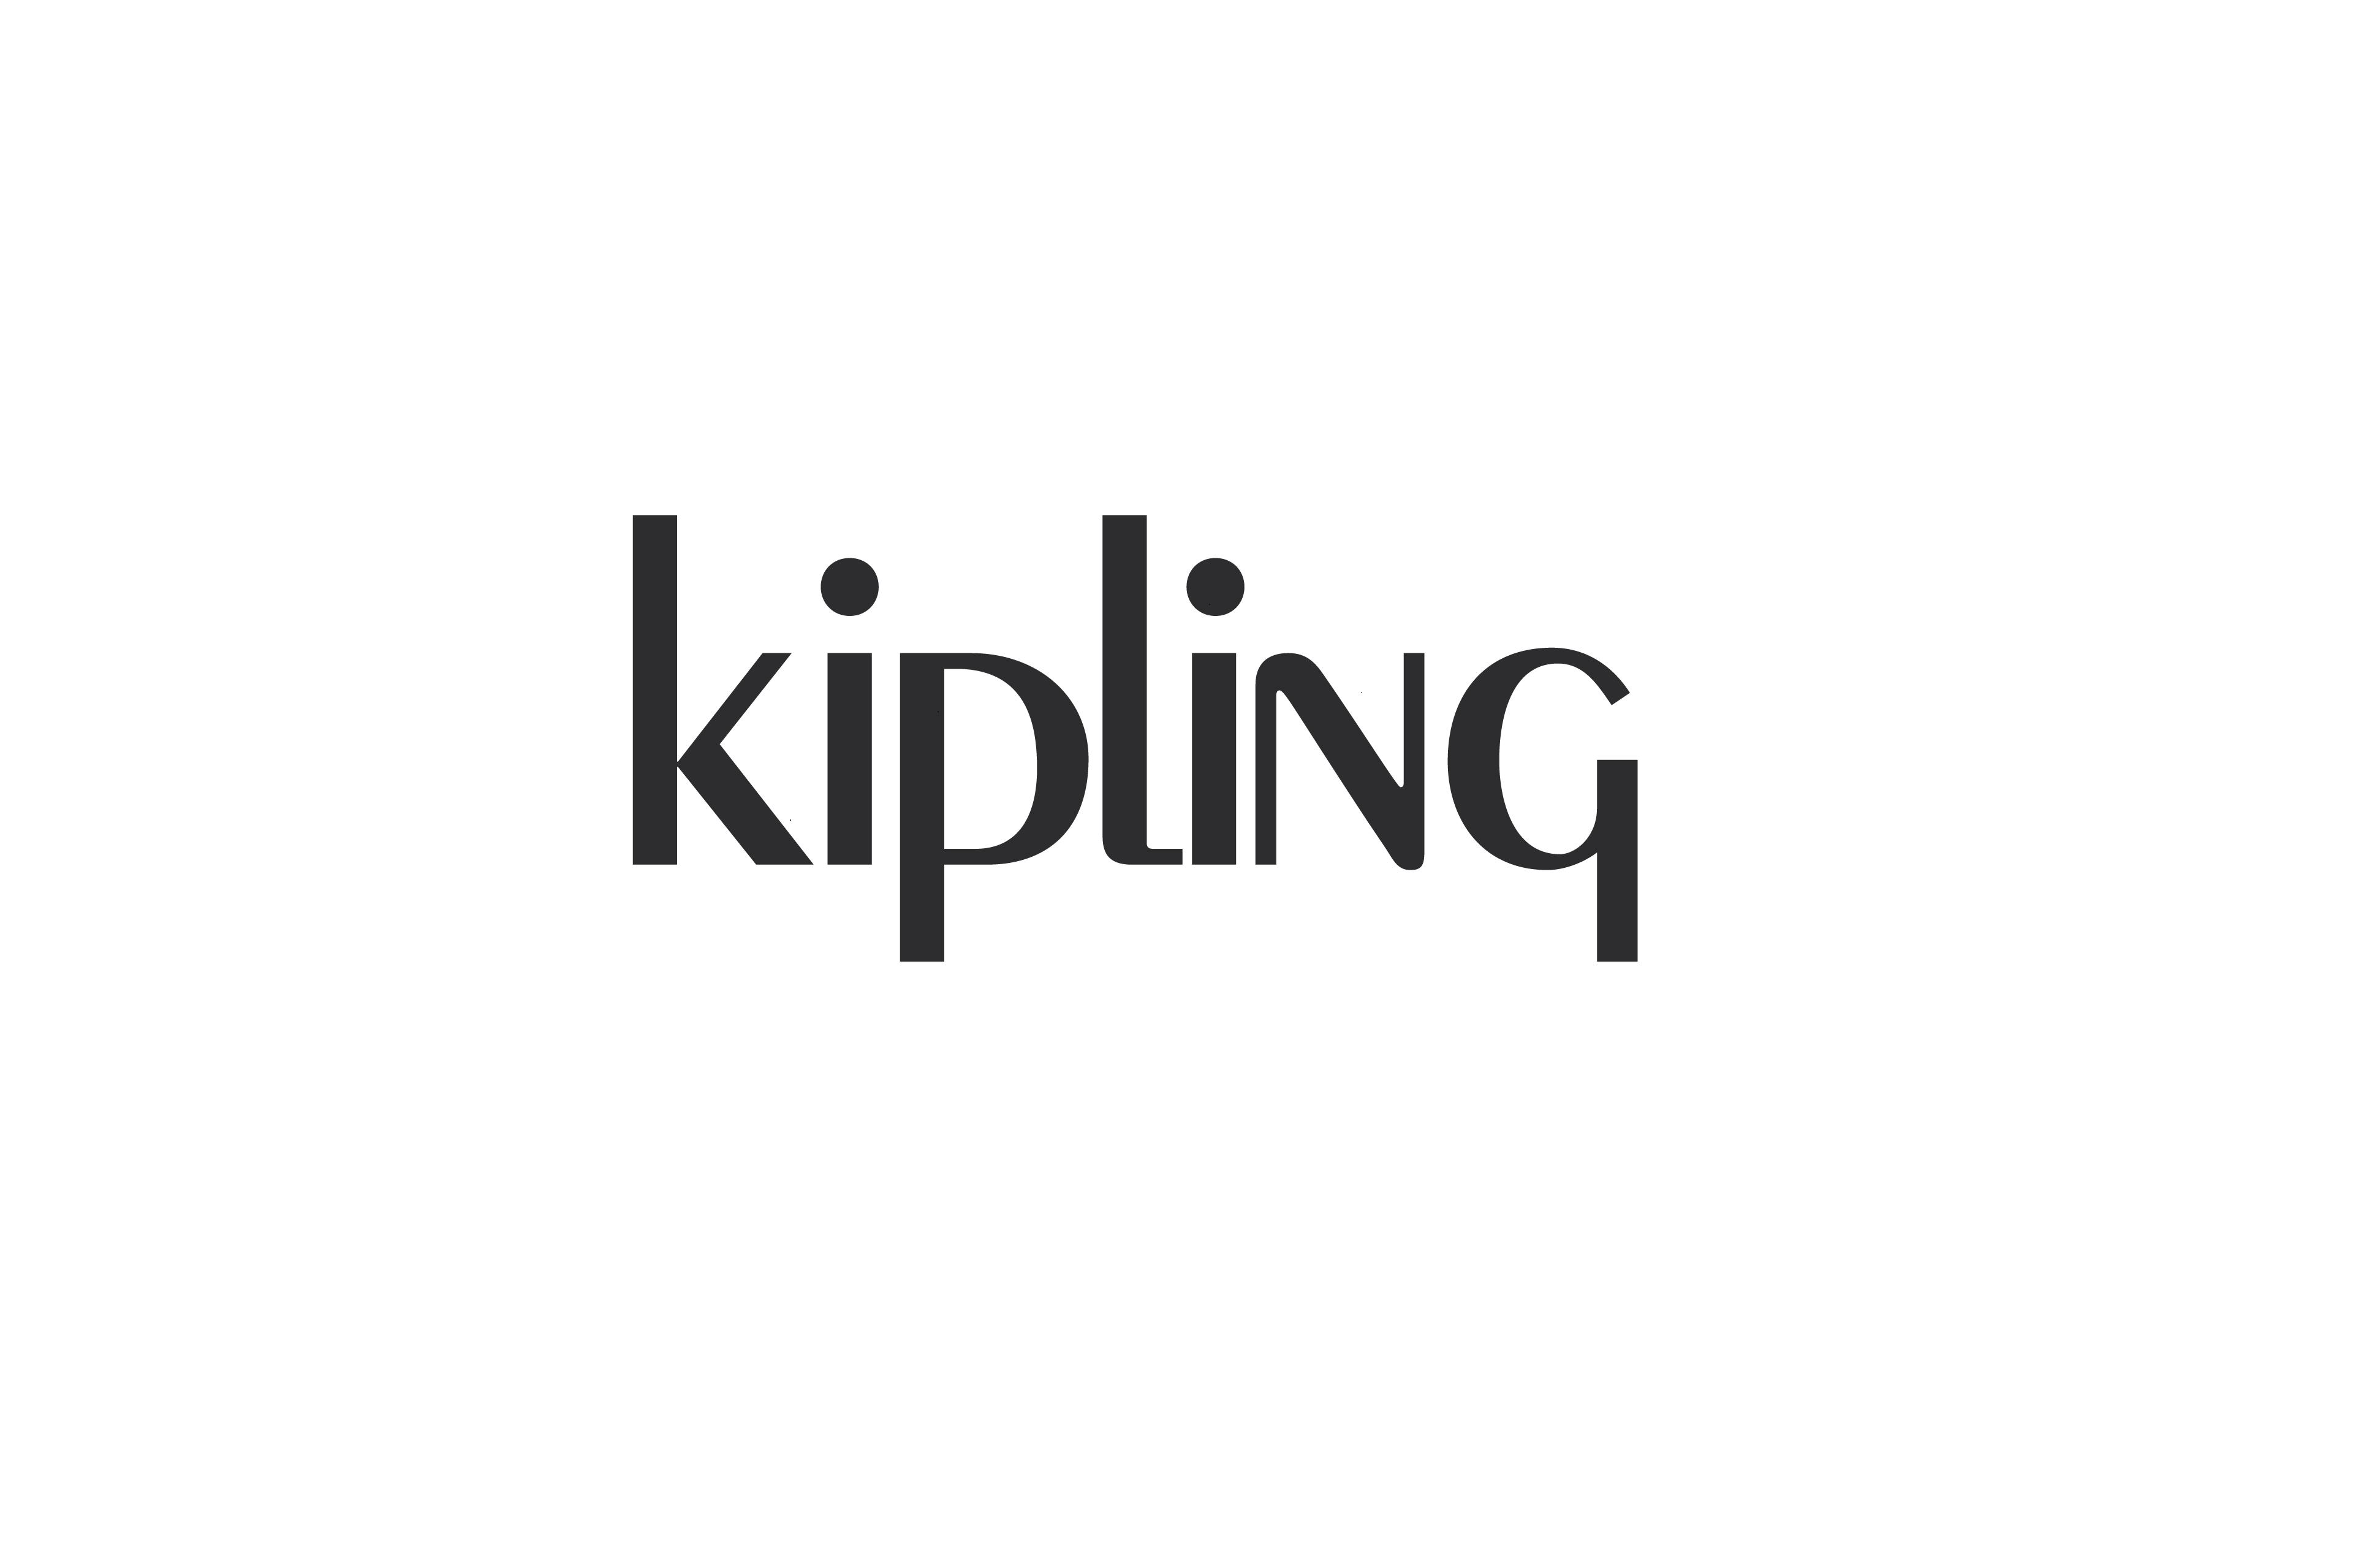 File:Kipling.png.